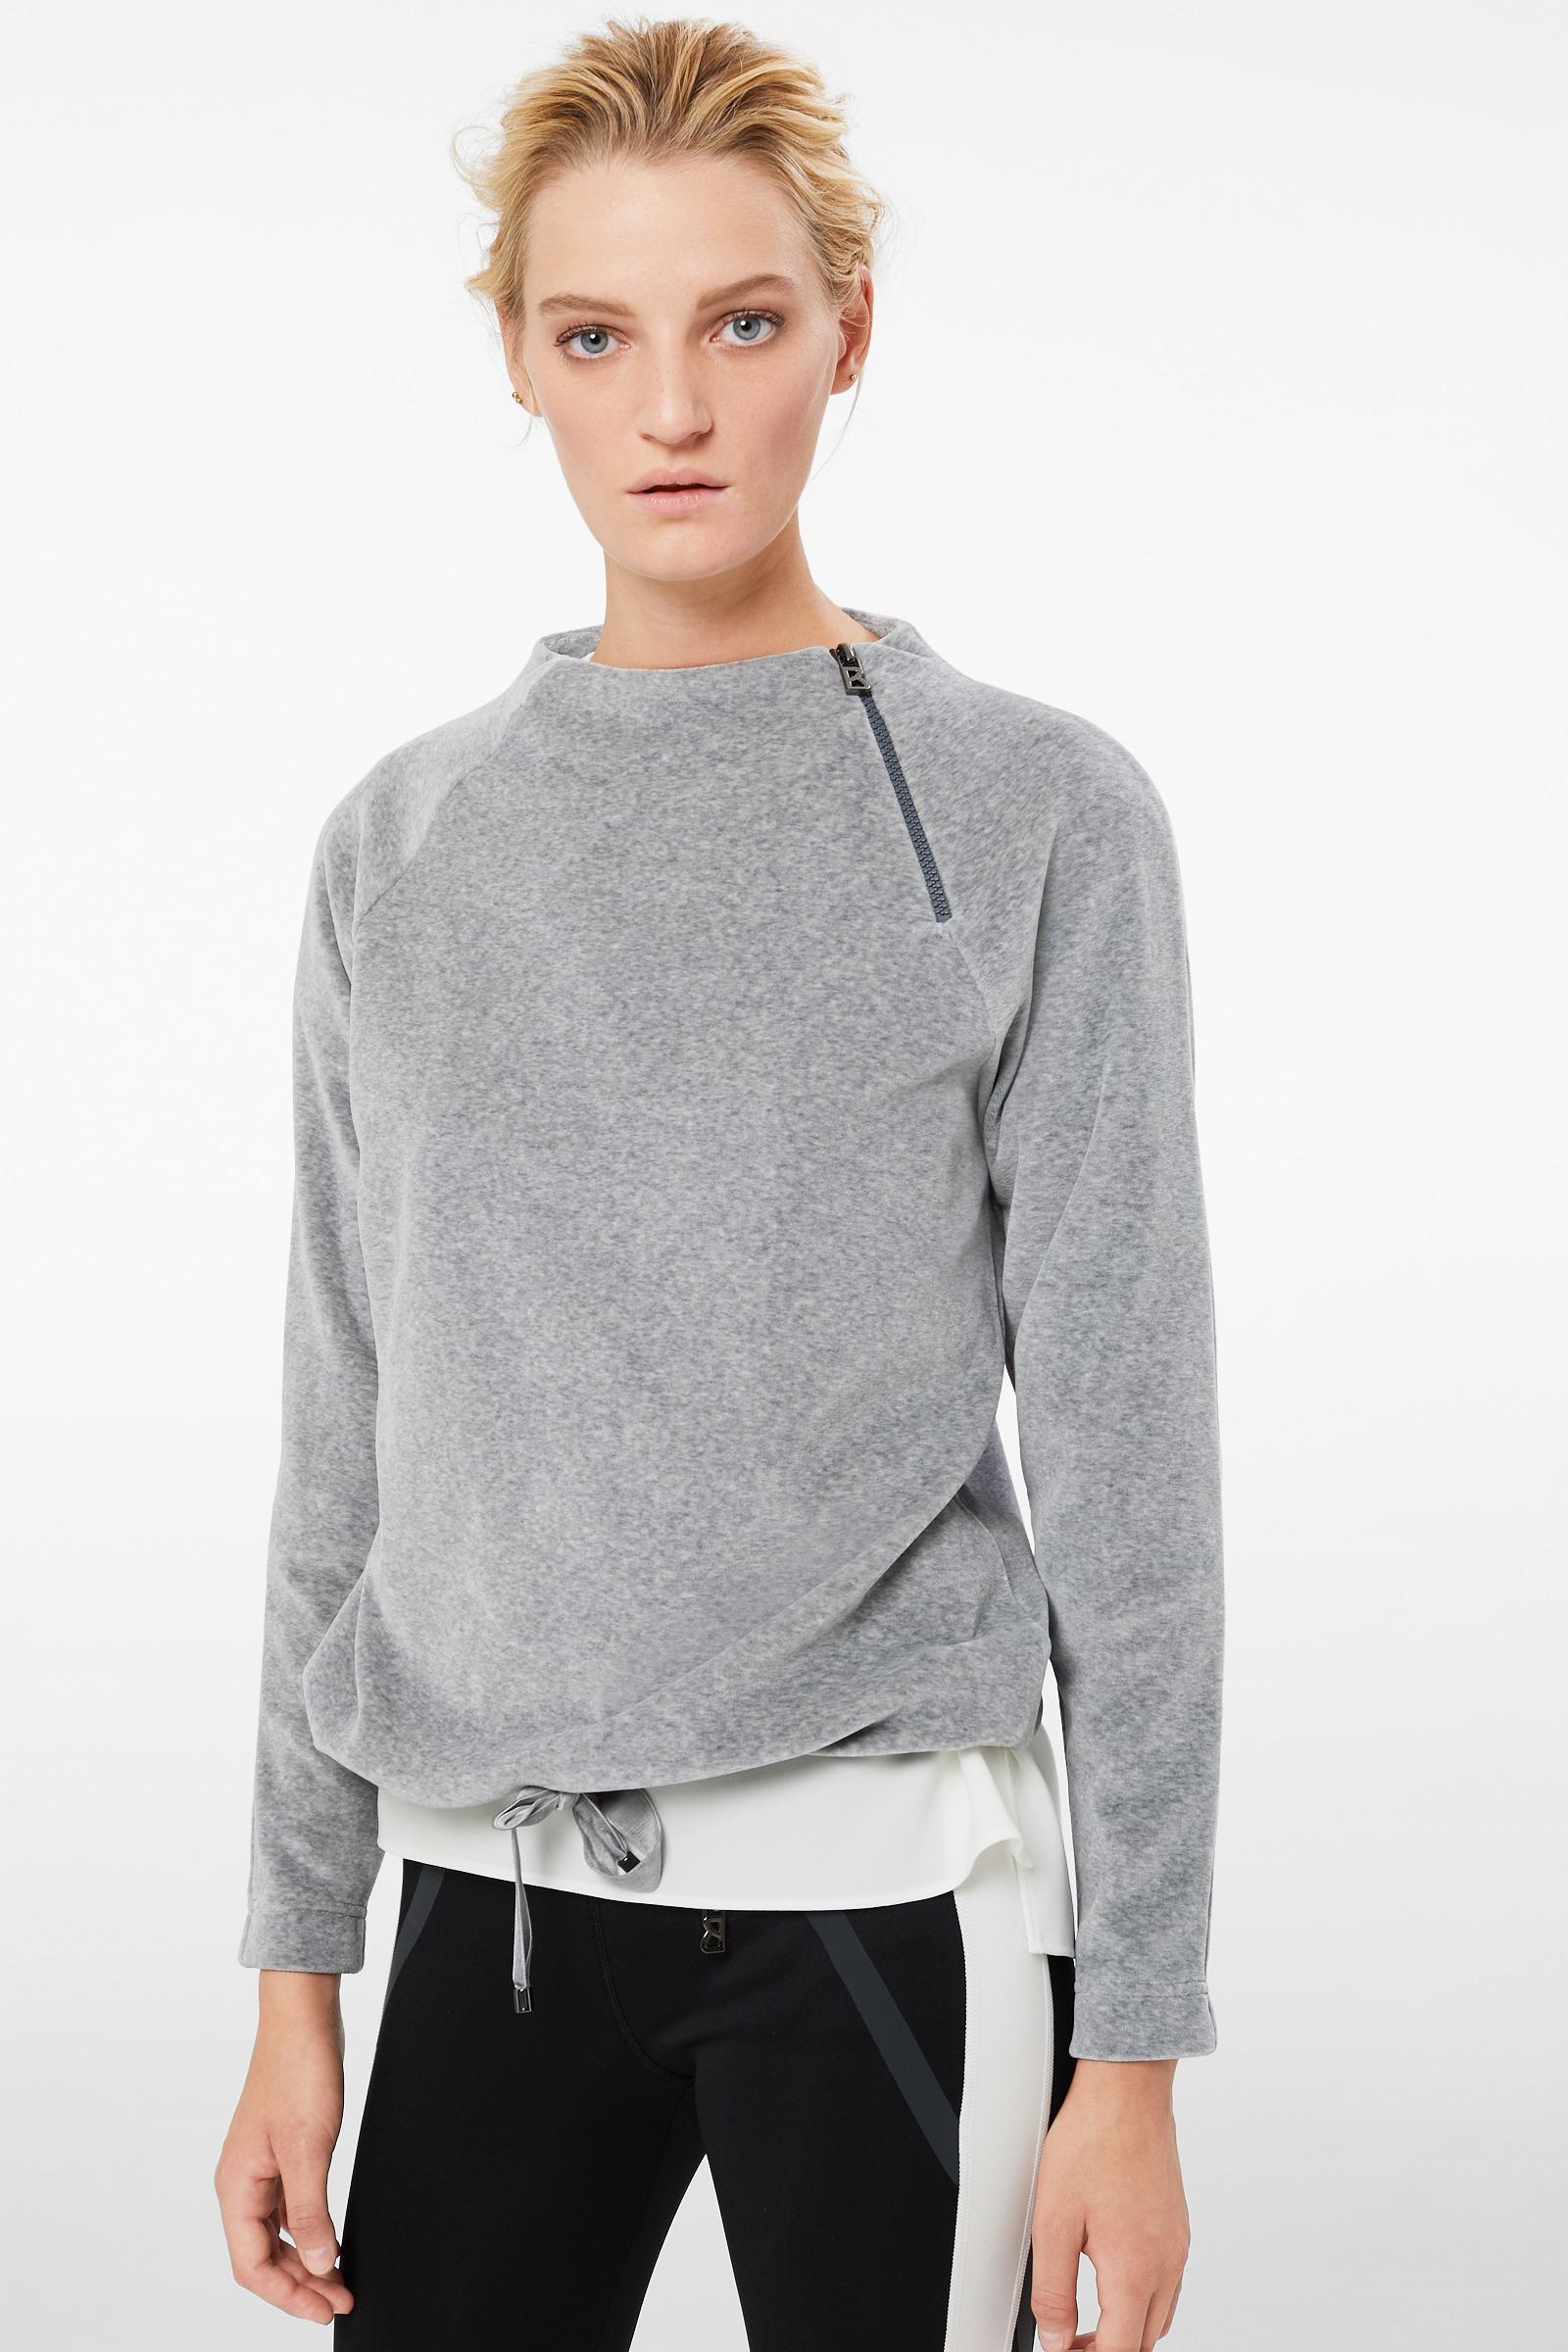 6a586c78a700c Bogner Smina Sweatshirt In Light Gray Mottled in Gray - Lyst